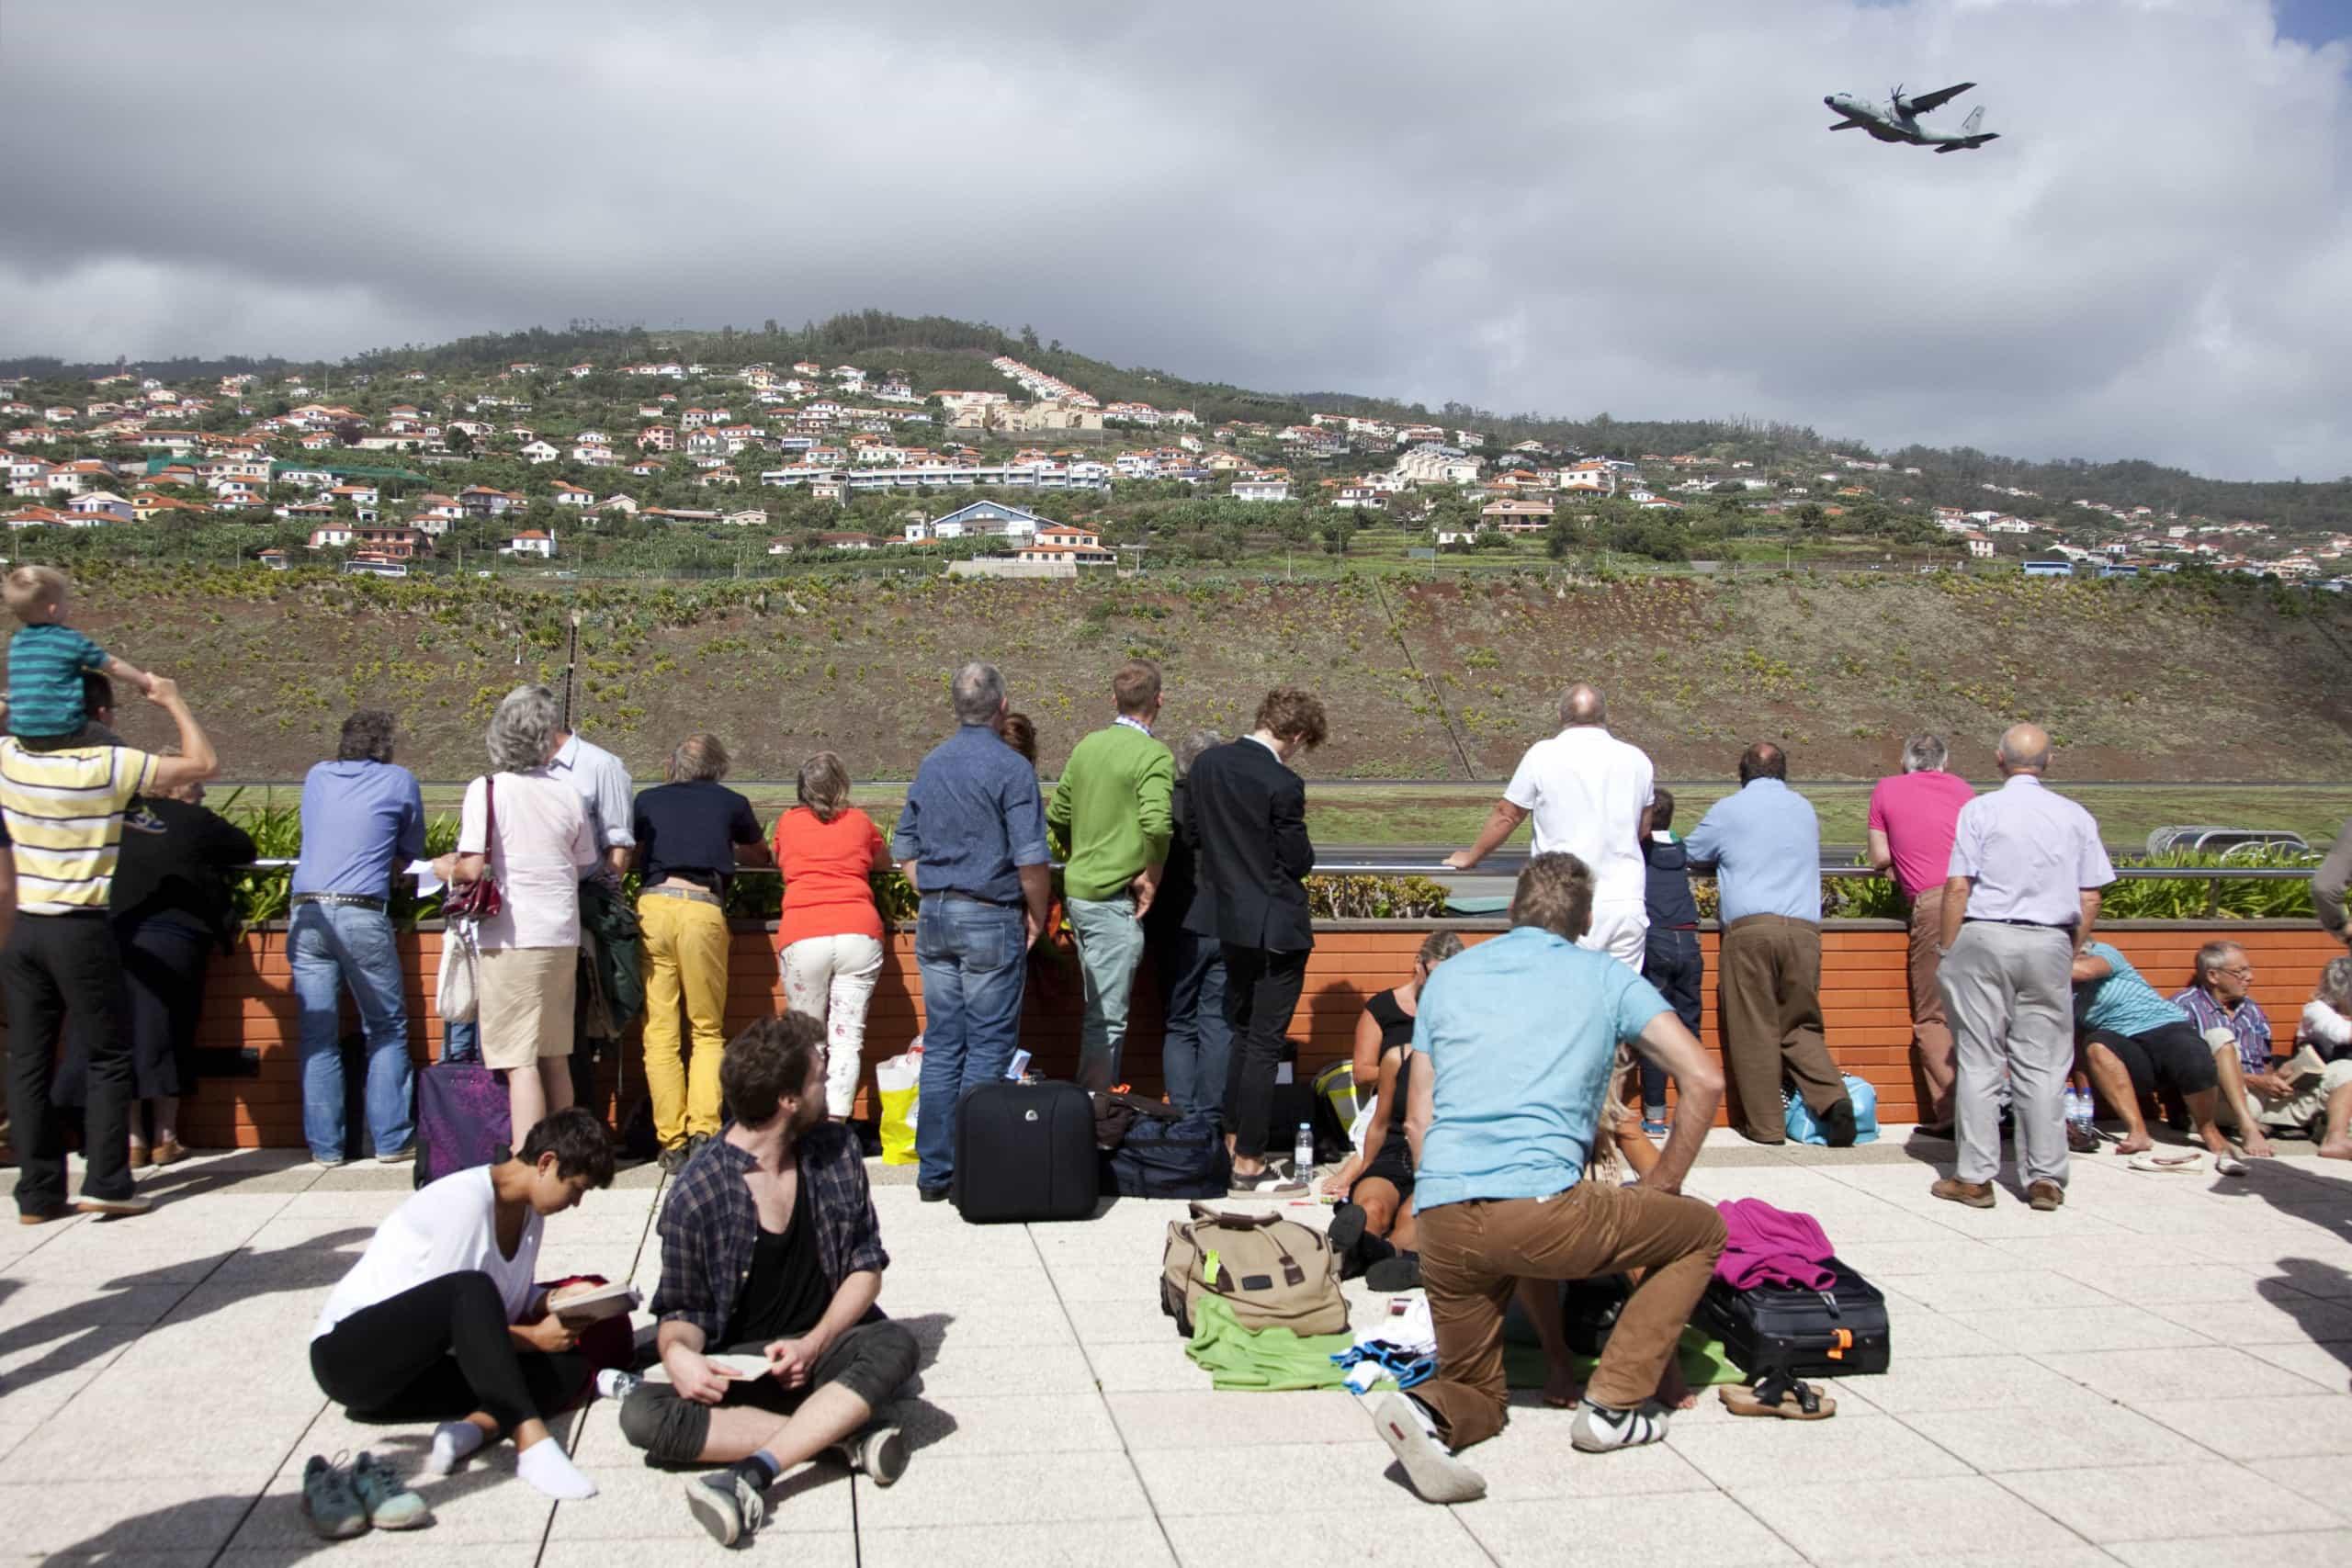 ANAC: Solução sobre limites de vento na Madeira será sempre científica